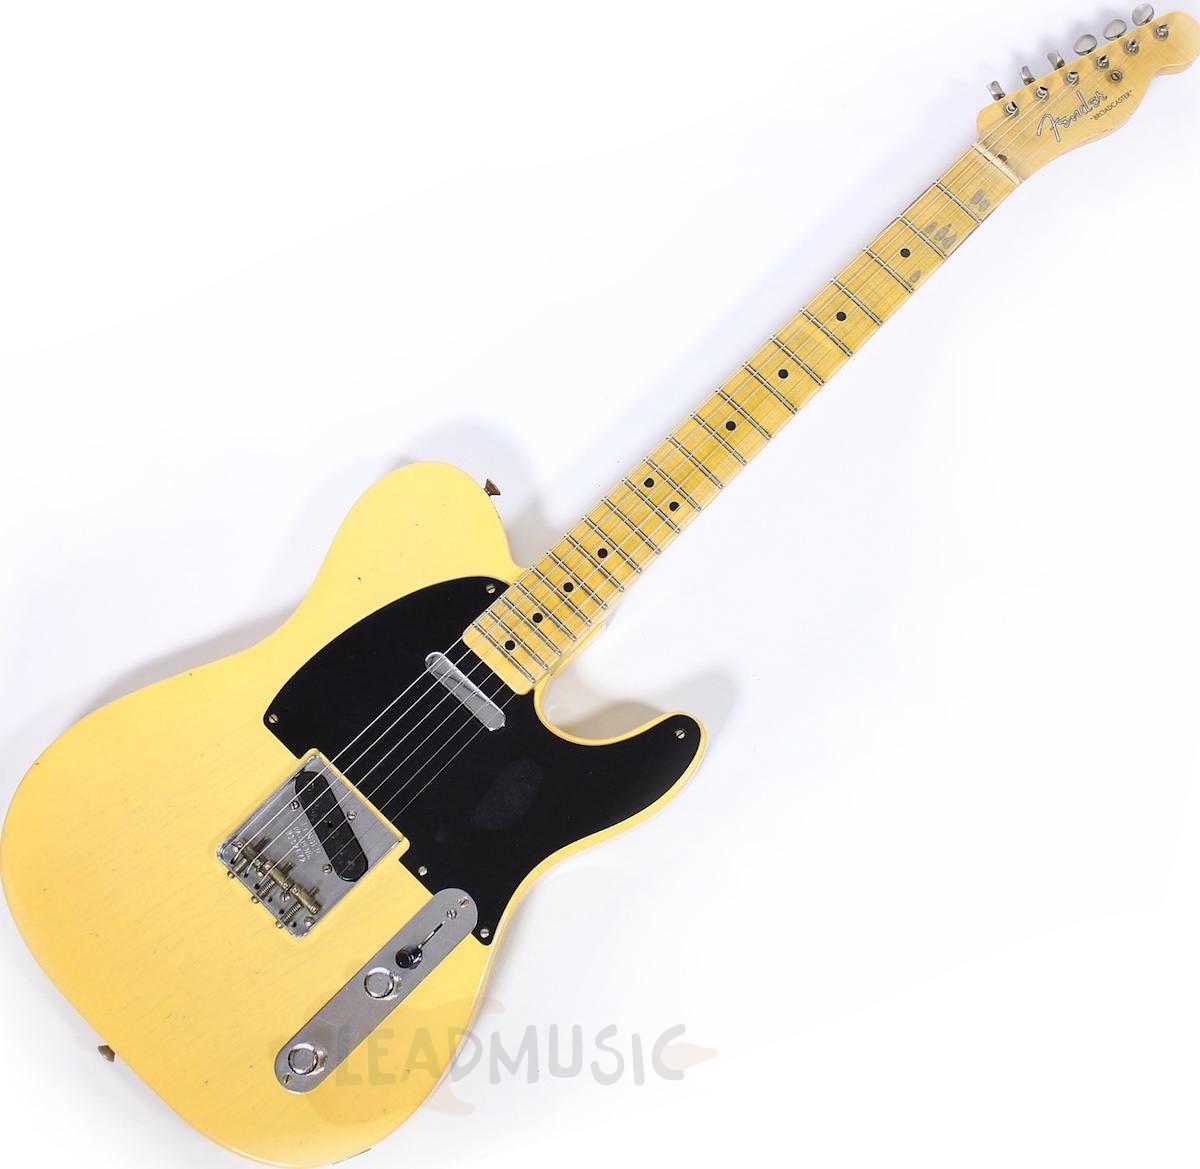 Fender Limited 70th Anniversary Broadcaster Journeyman